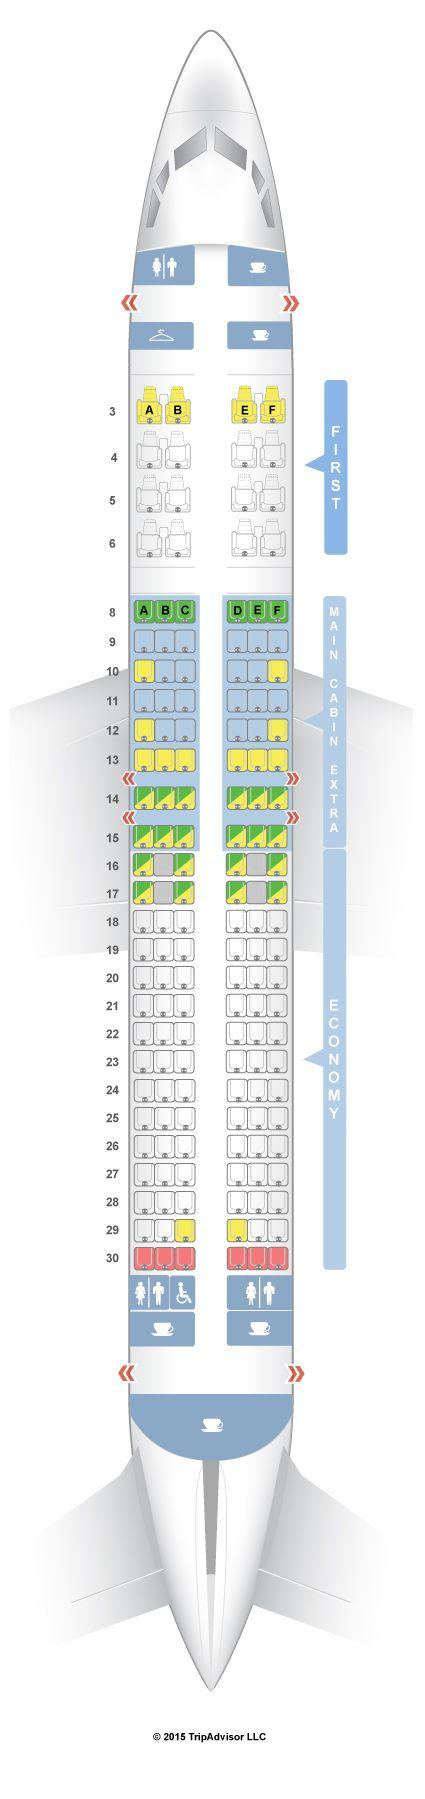 SeatGuru Seat Map American Airlines Boeing 737-800 (738) V2